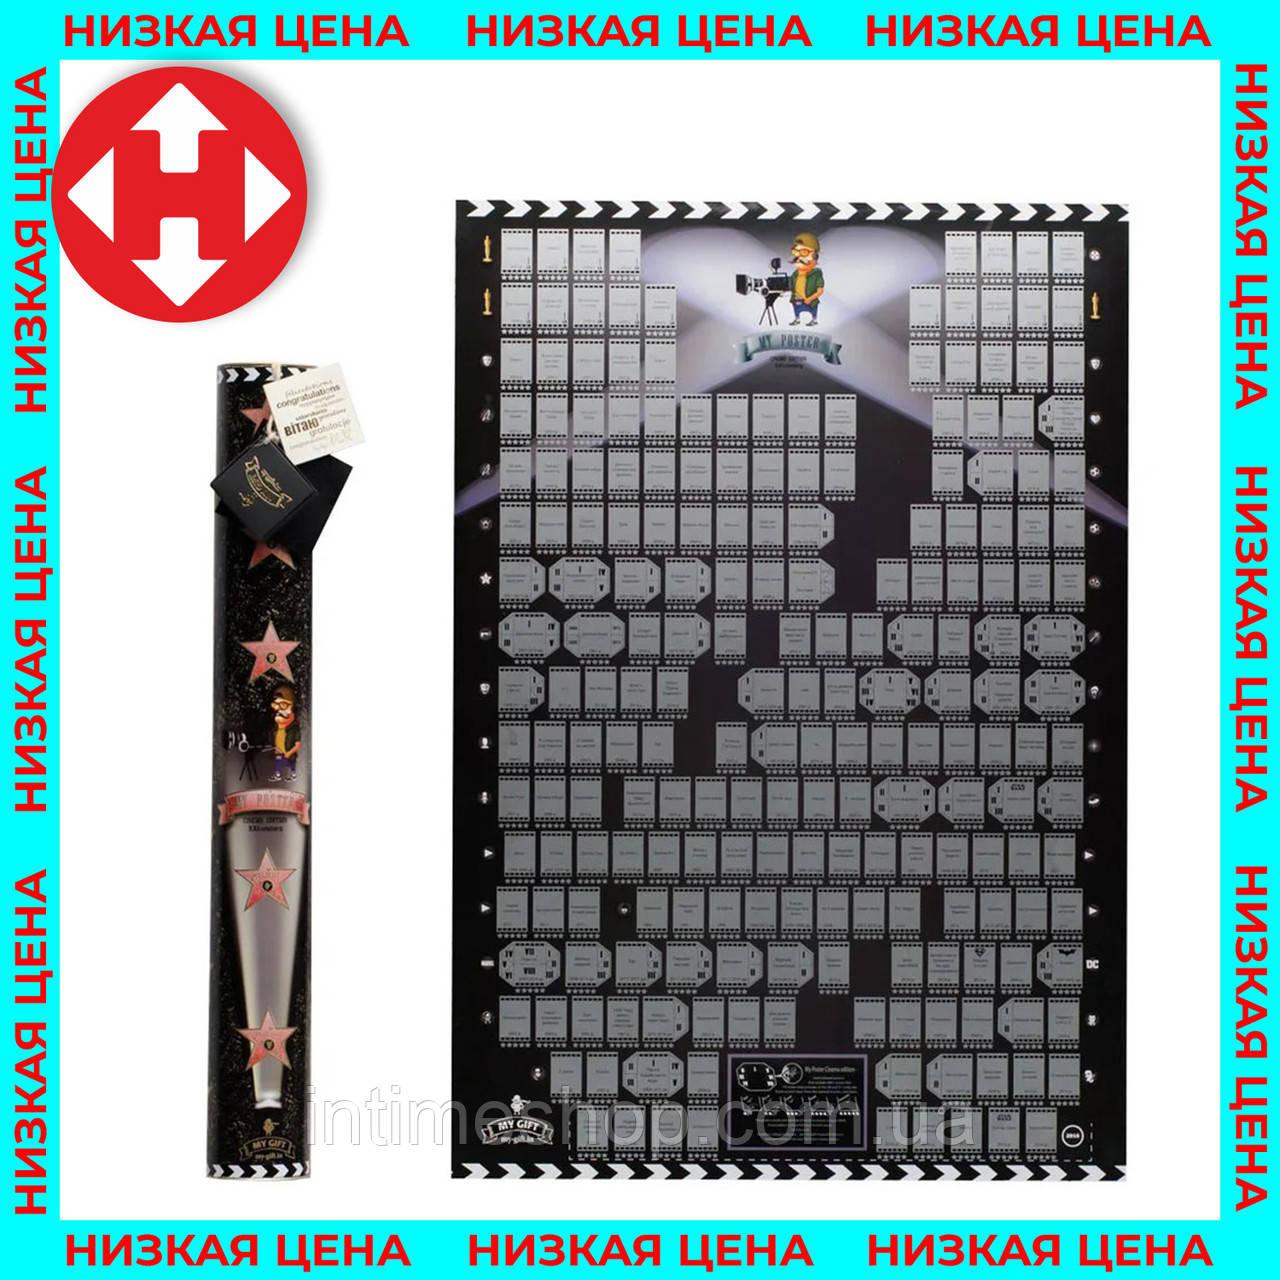 Скретч постер, My Poster Cinema Edition 21 century, постер достижений, UKR